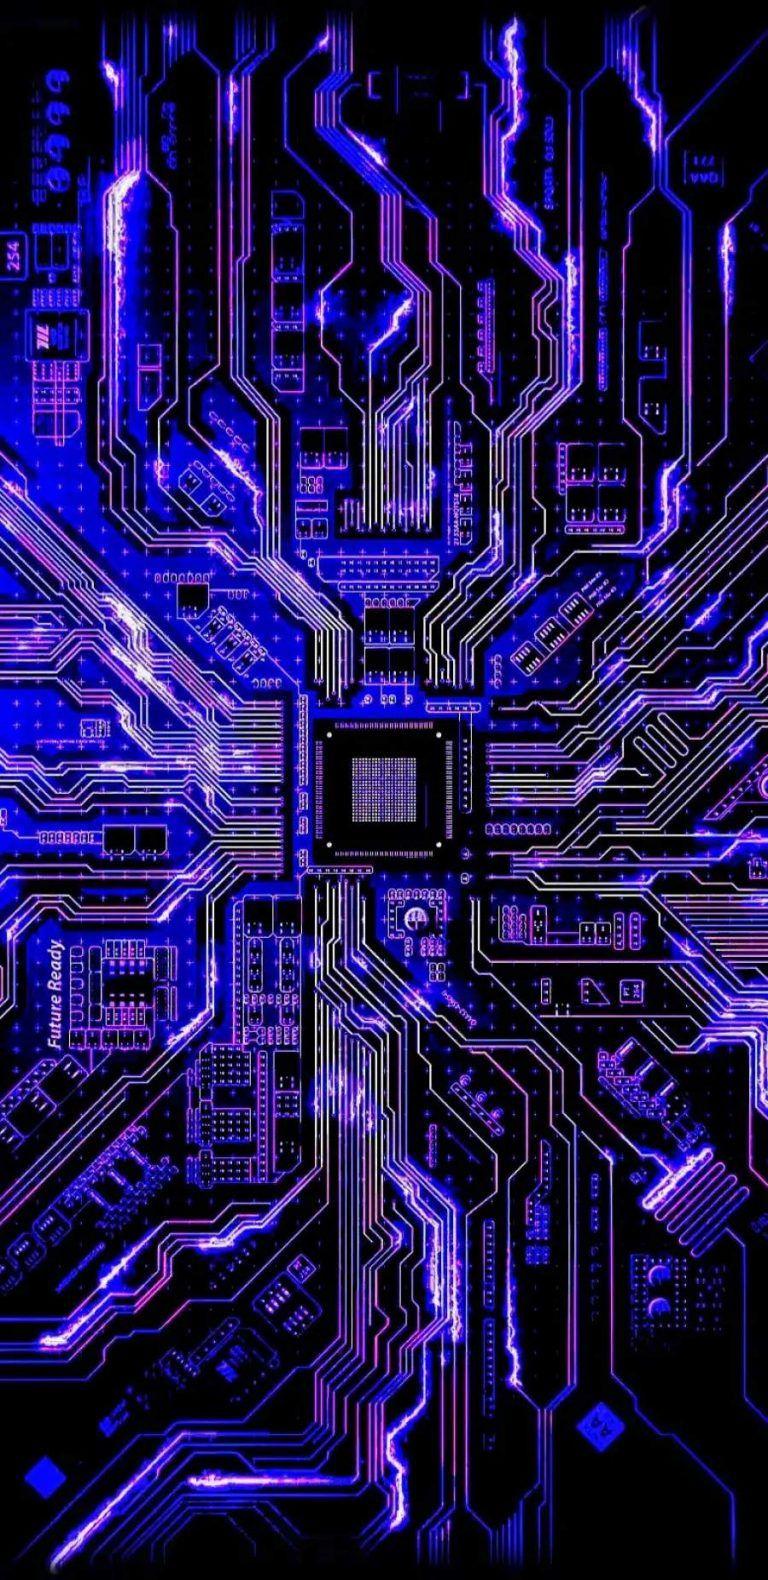 Circuit Board iPhone Wallpaper - iPhone Wallpapers